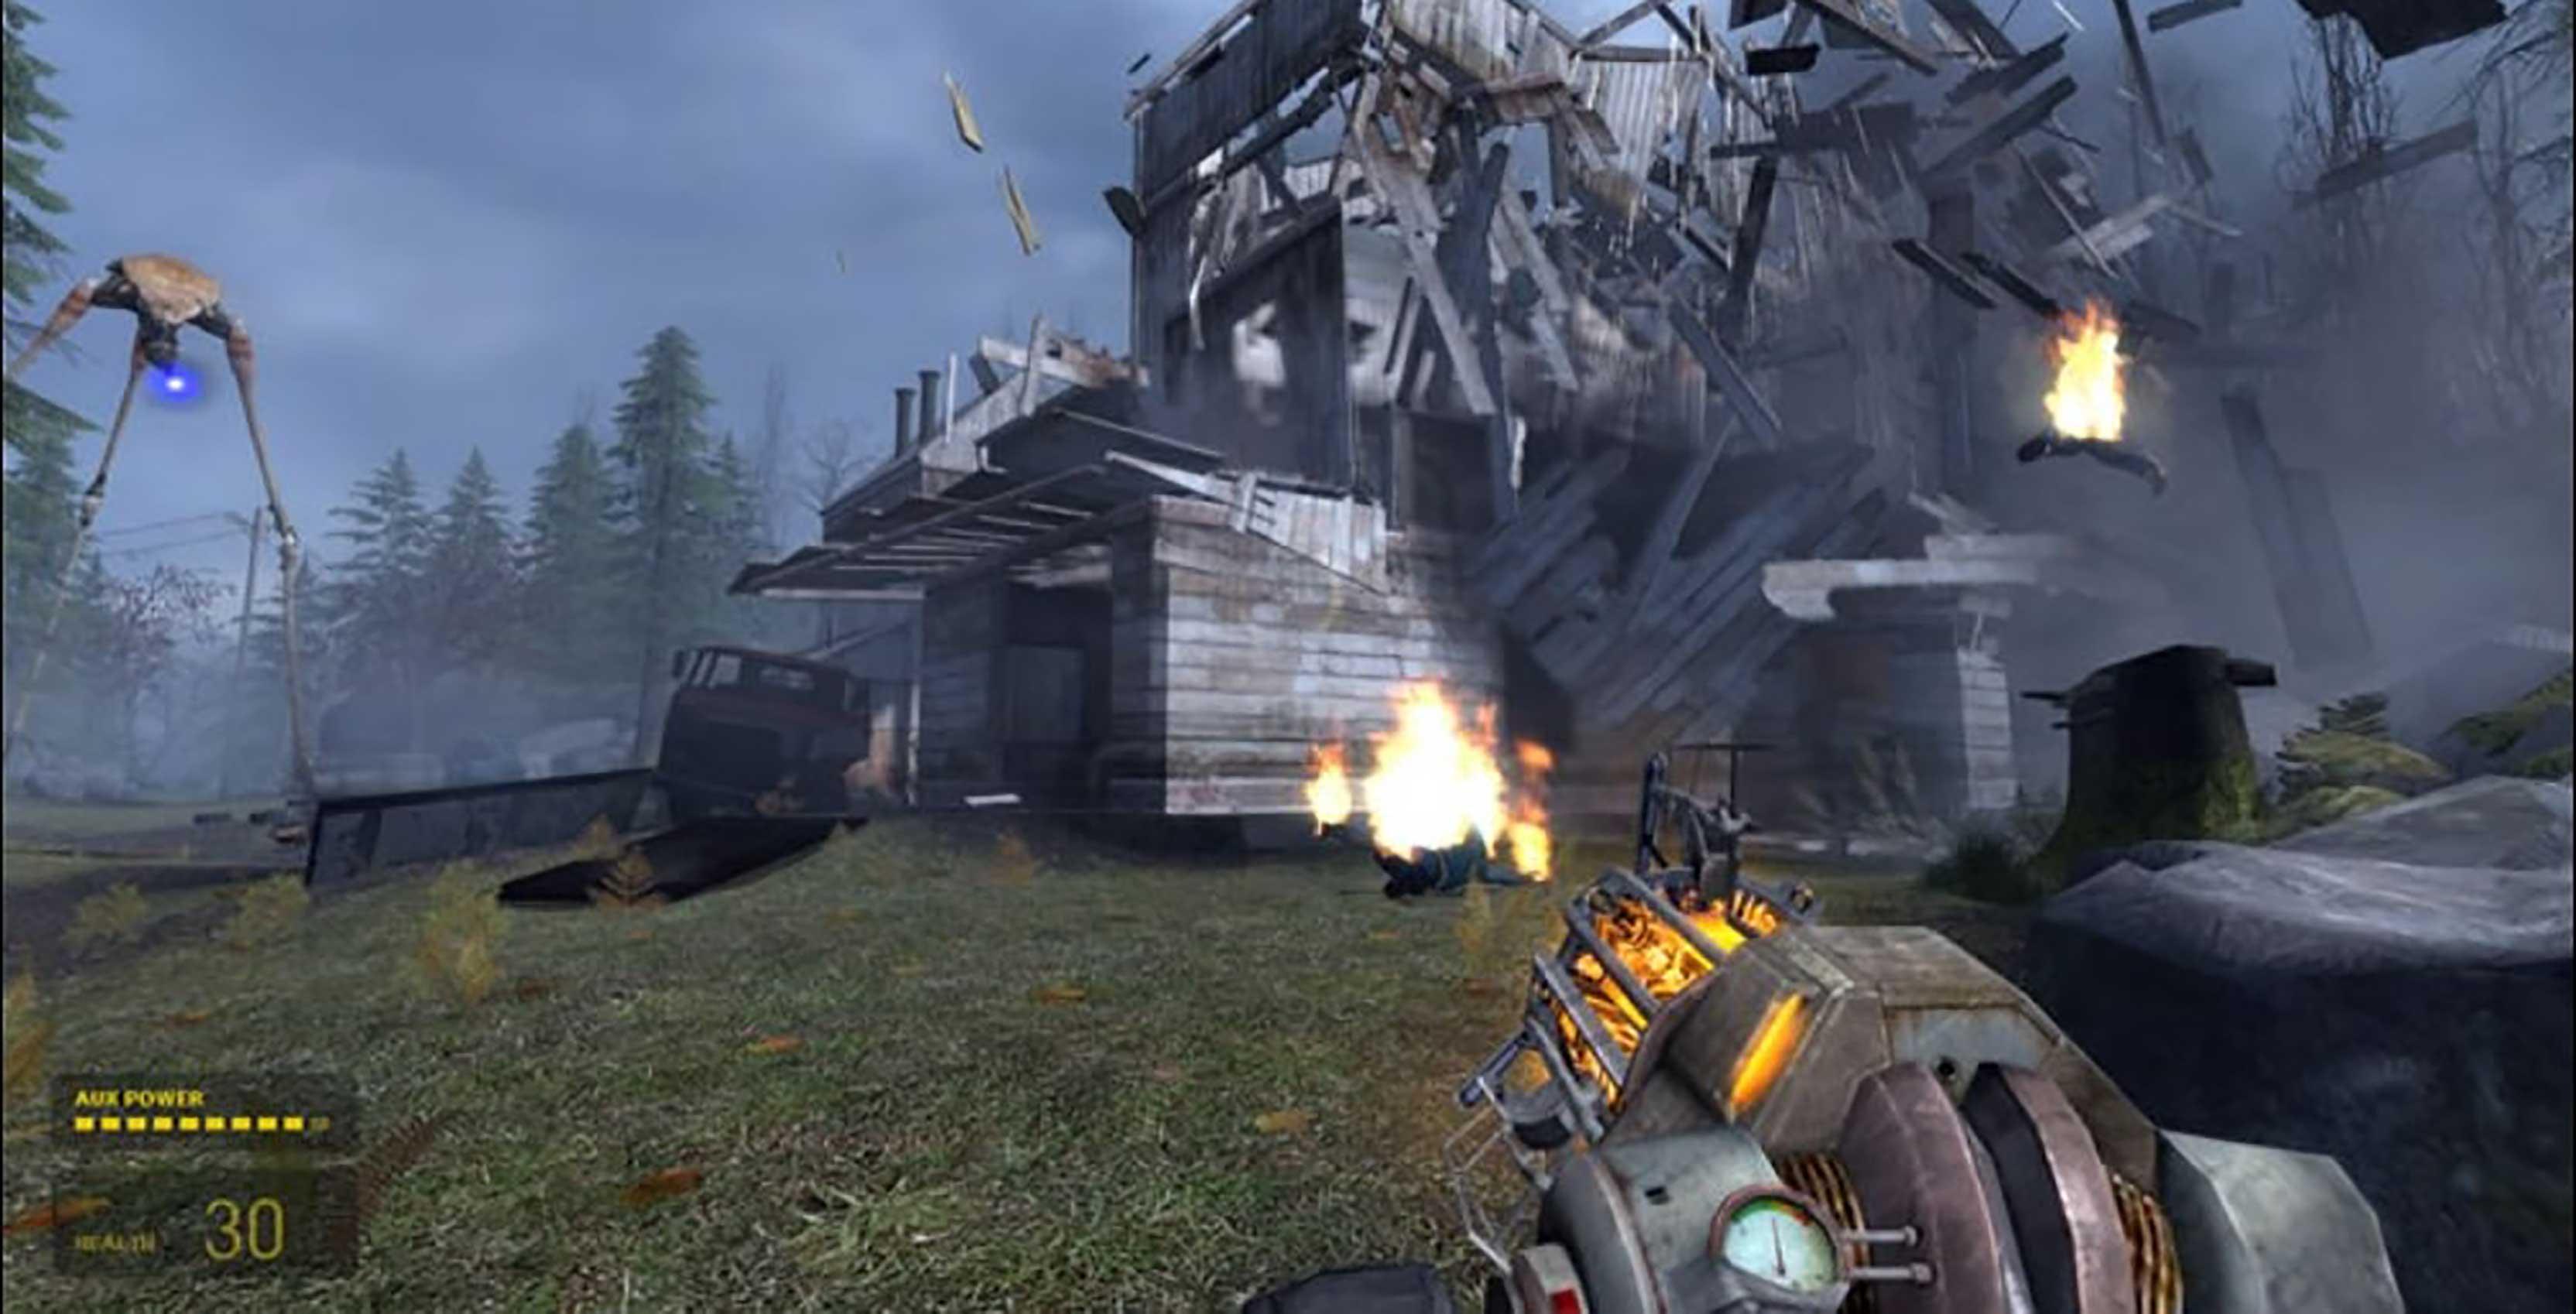 Half-Life 2 combat